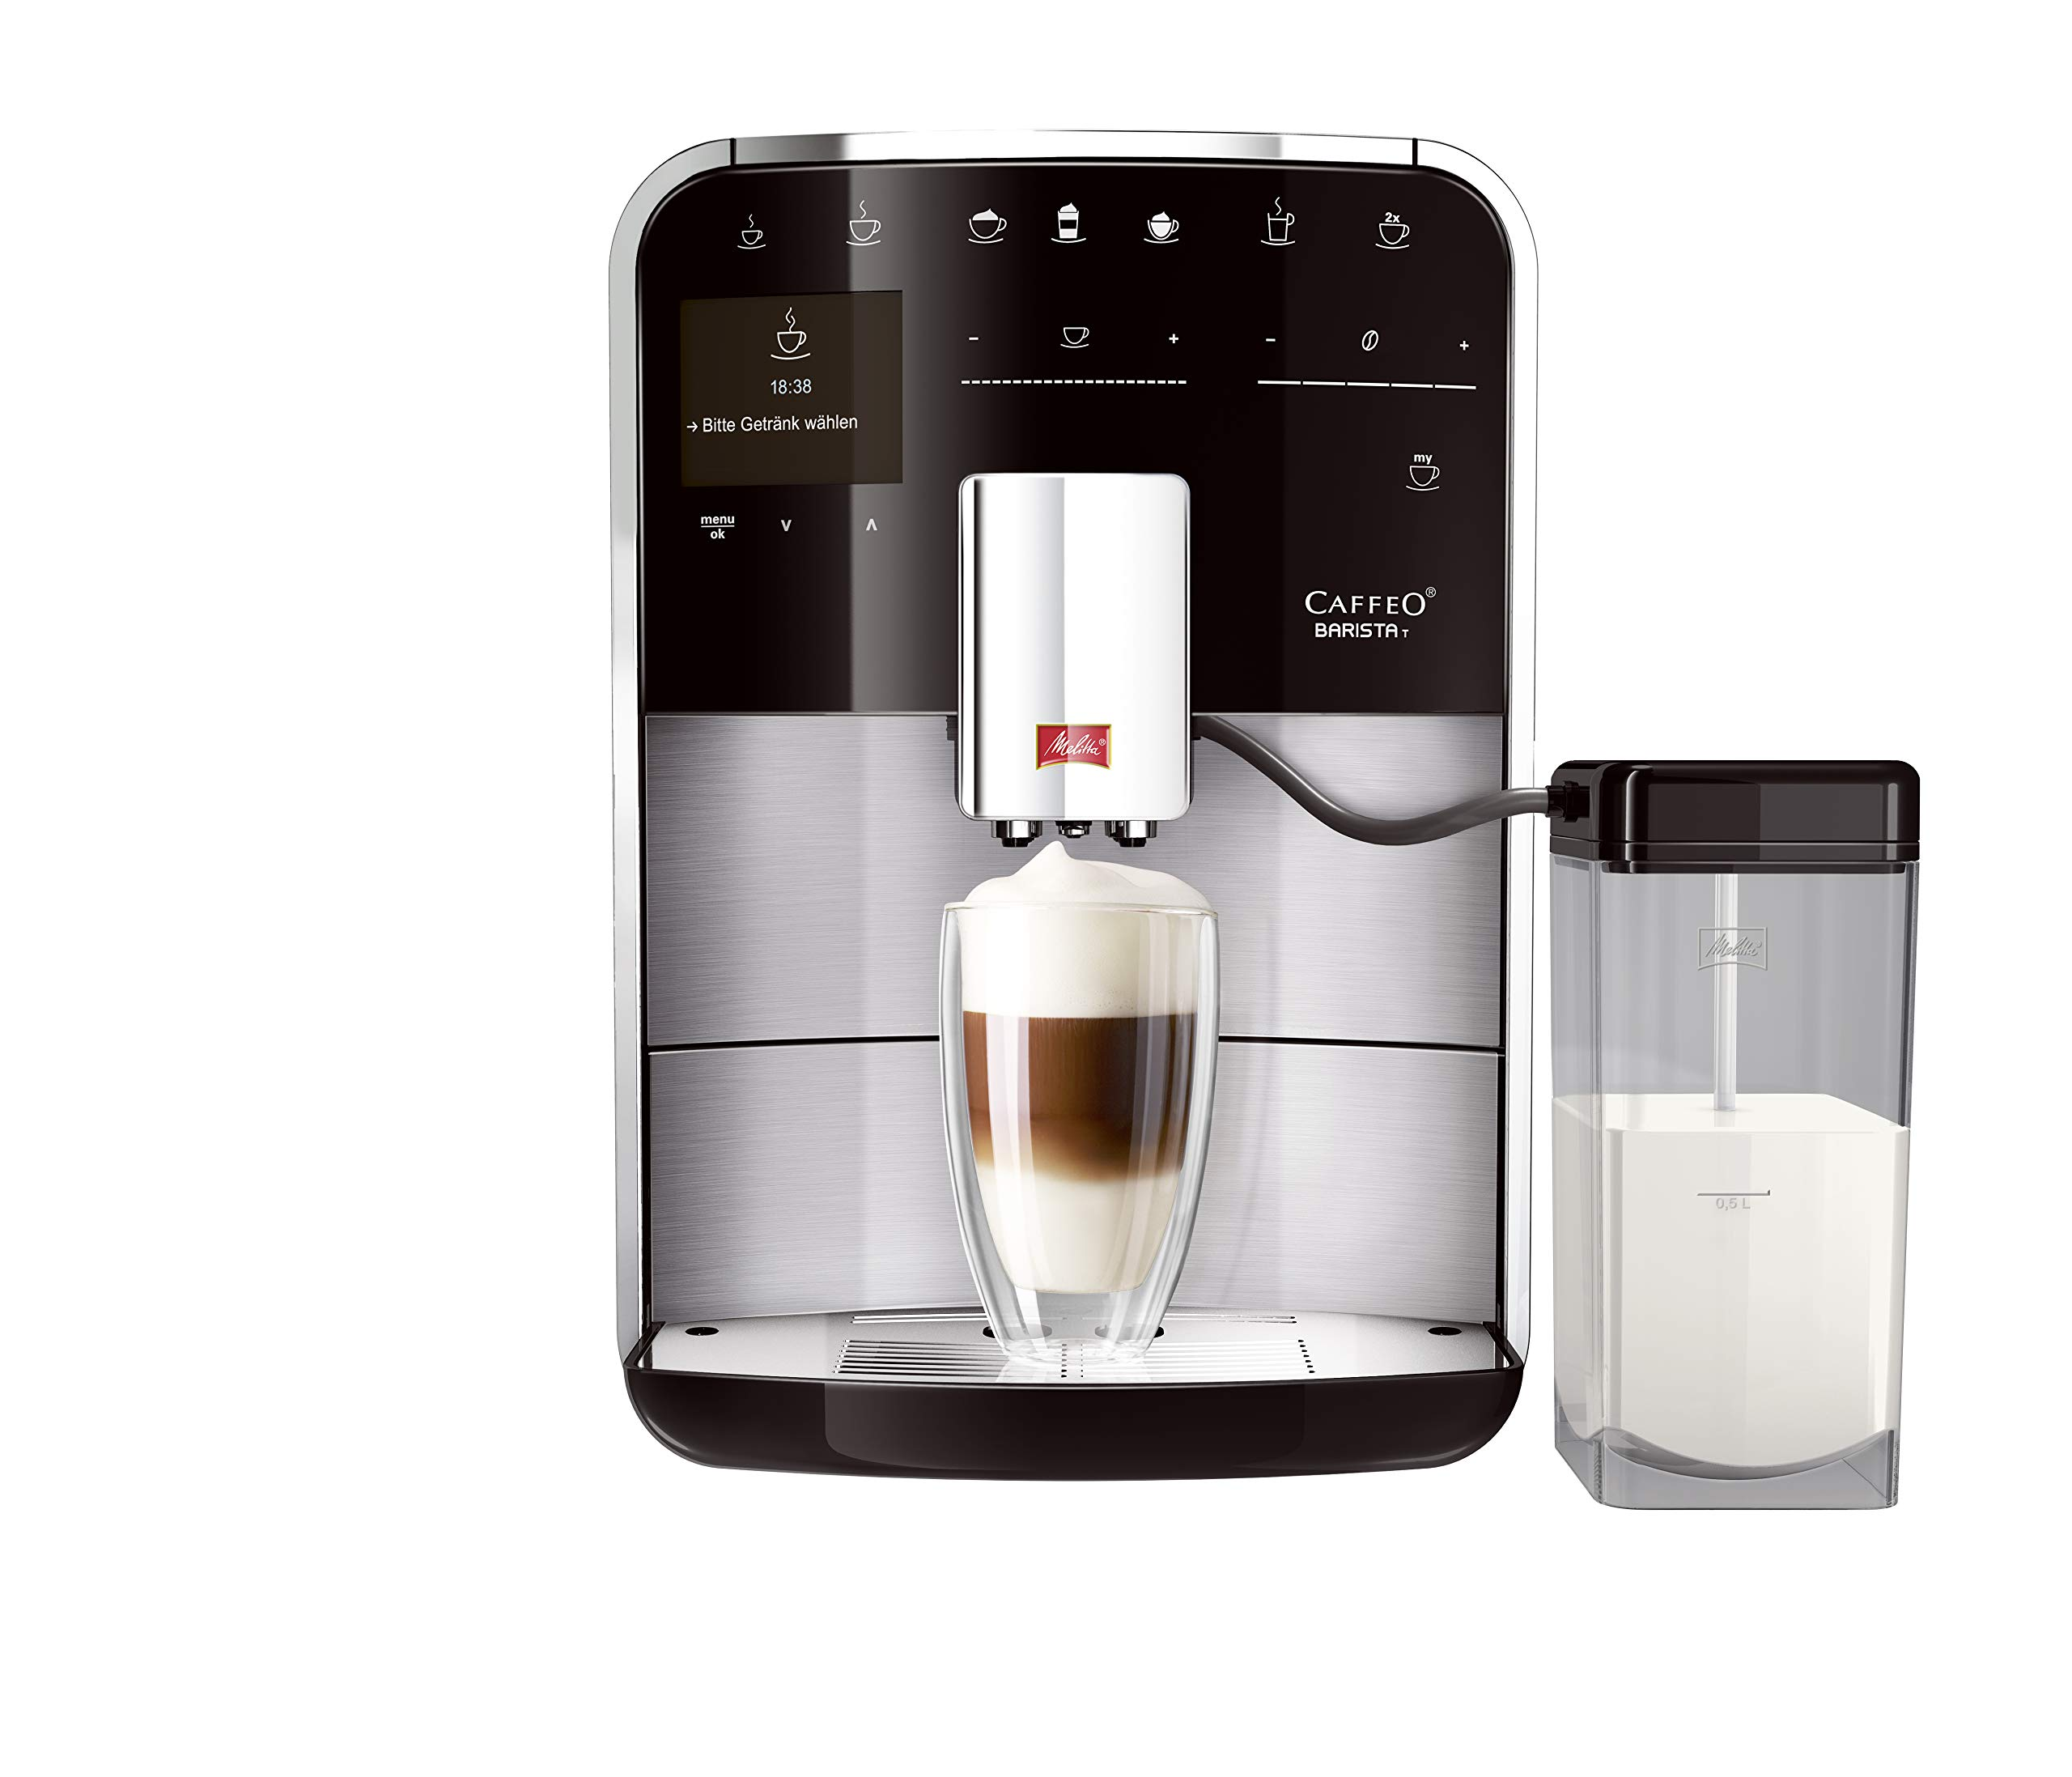 Melitta-217373-Caffeo-Barista-T-F-740-200-Kaffeevollautomat-frs-Bro-Touch-Funktion-Edelstahl-Kunststoff